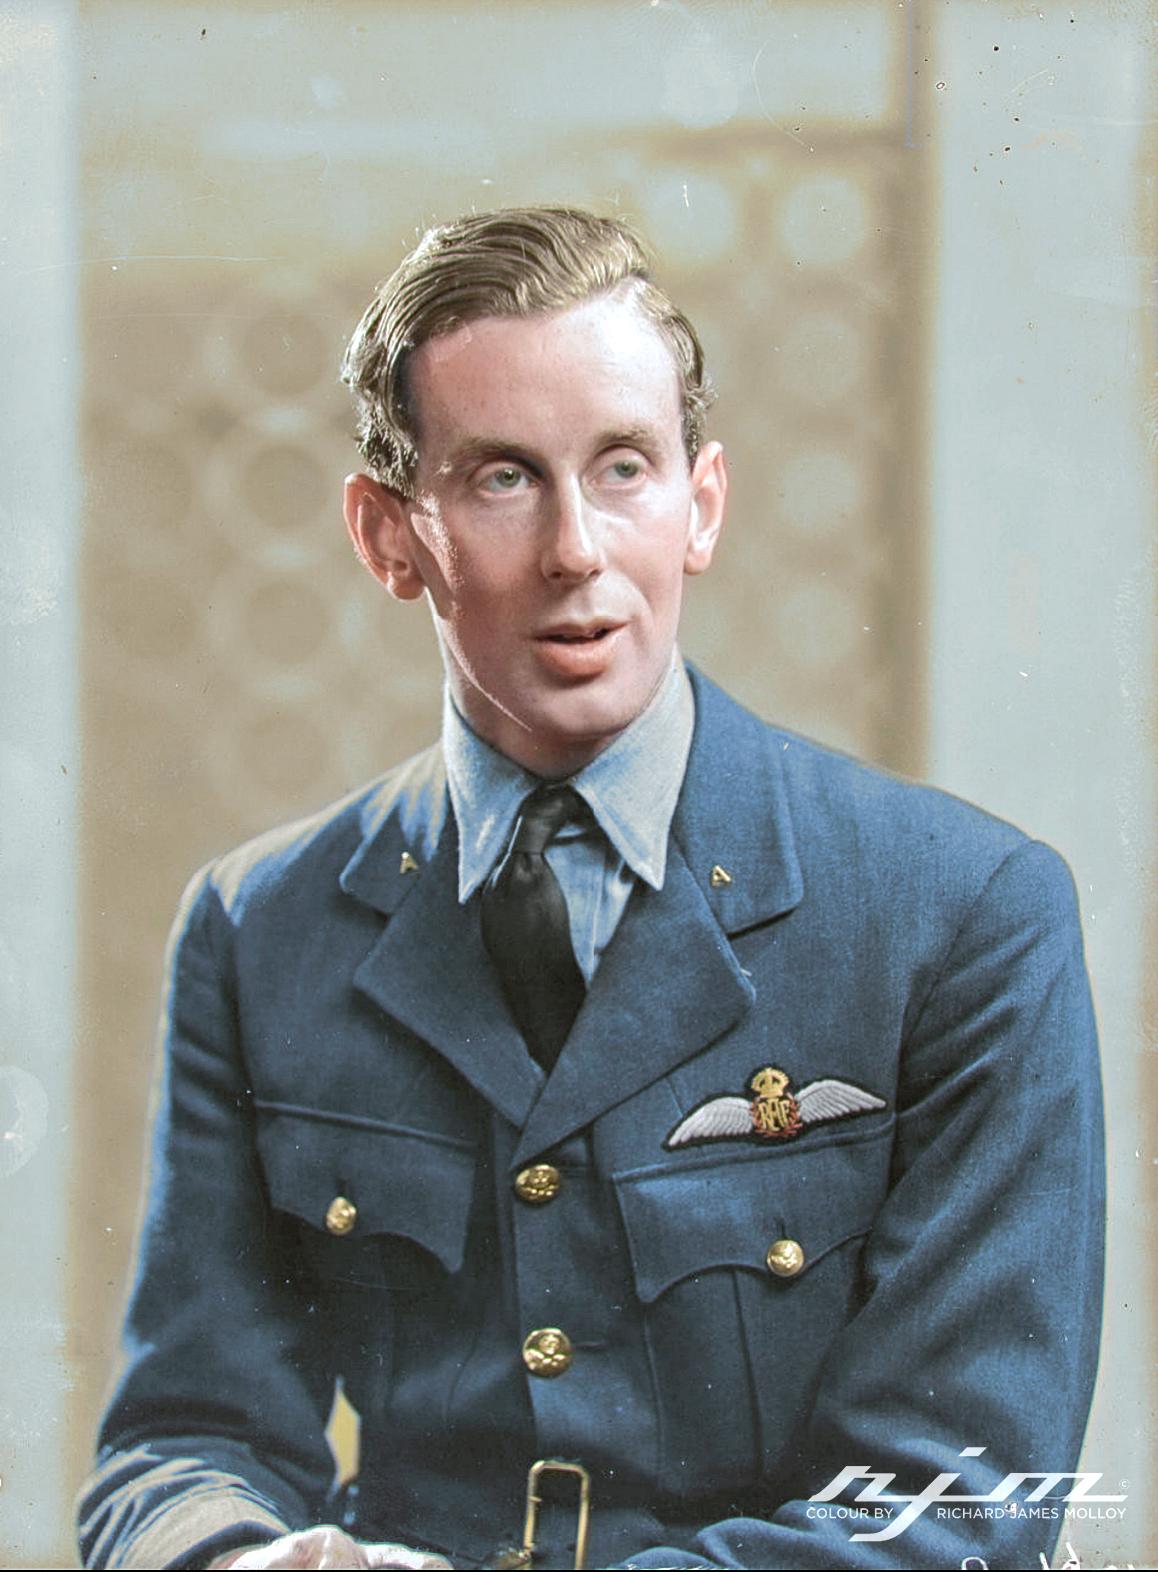 Aircrew RAF 609Sqn John Dundas shot down Wick Nov 1940 02